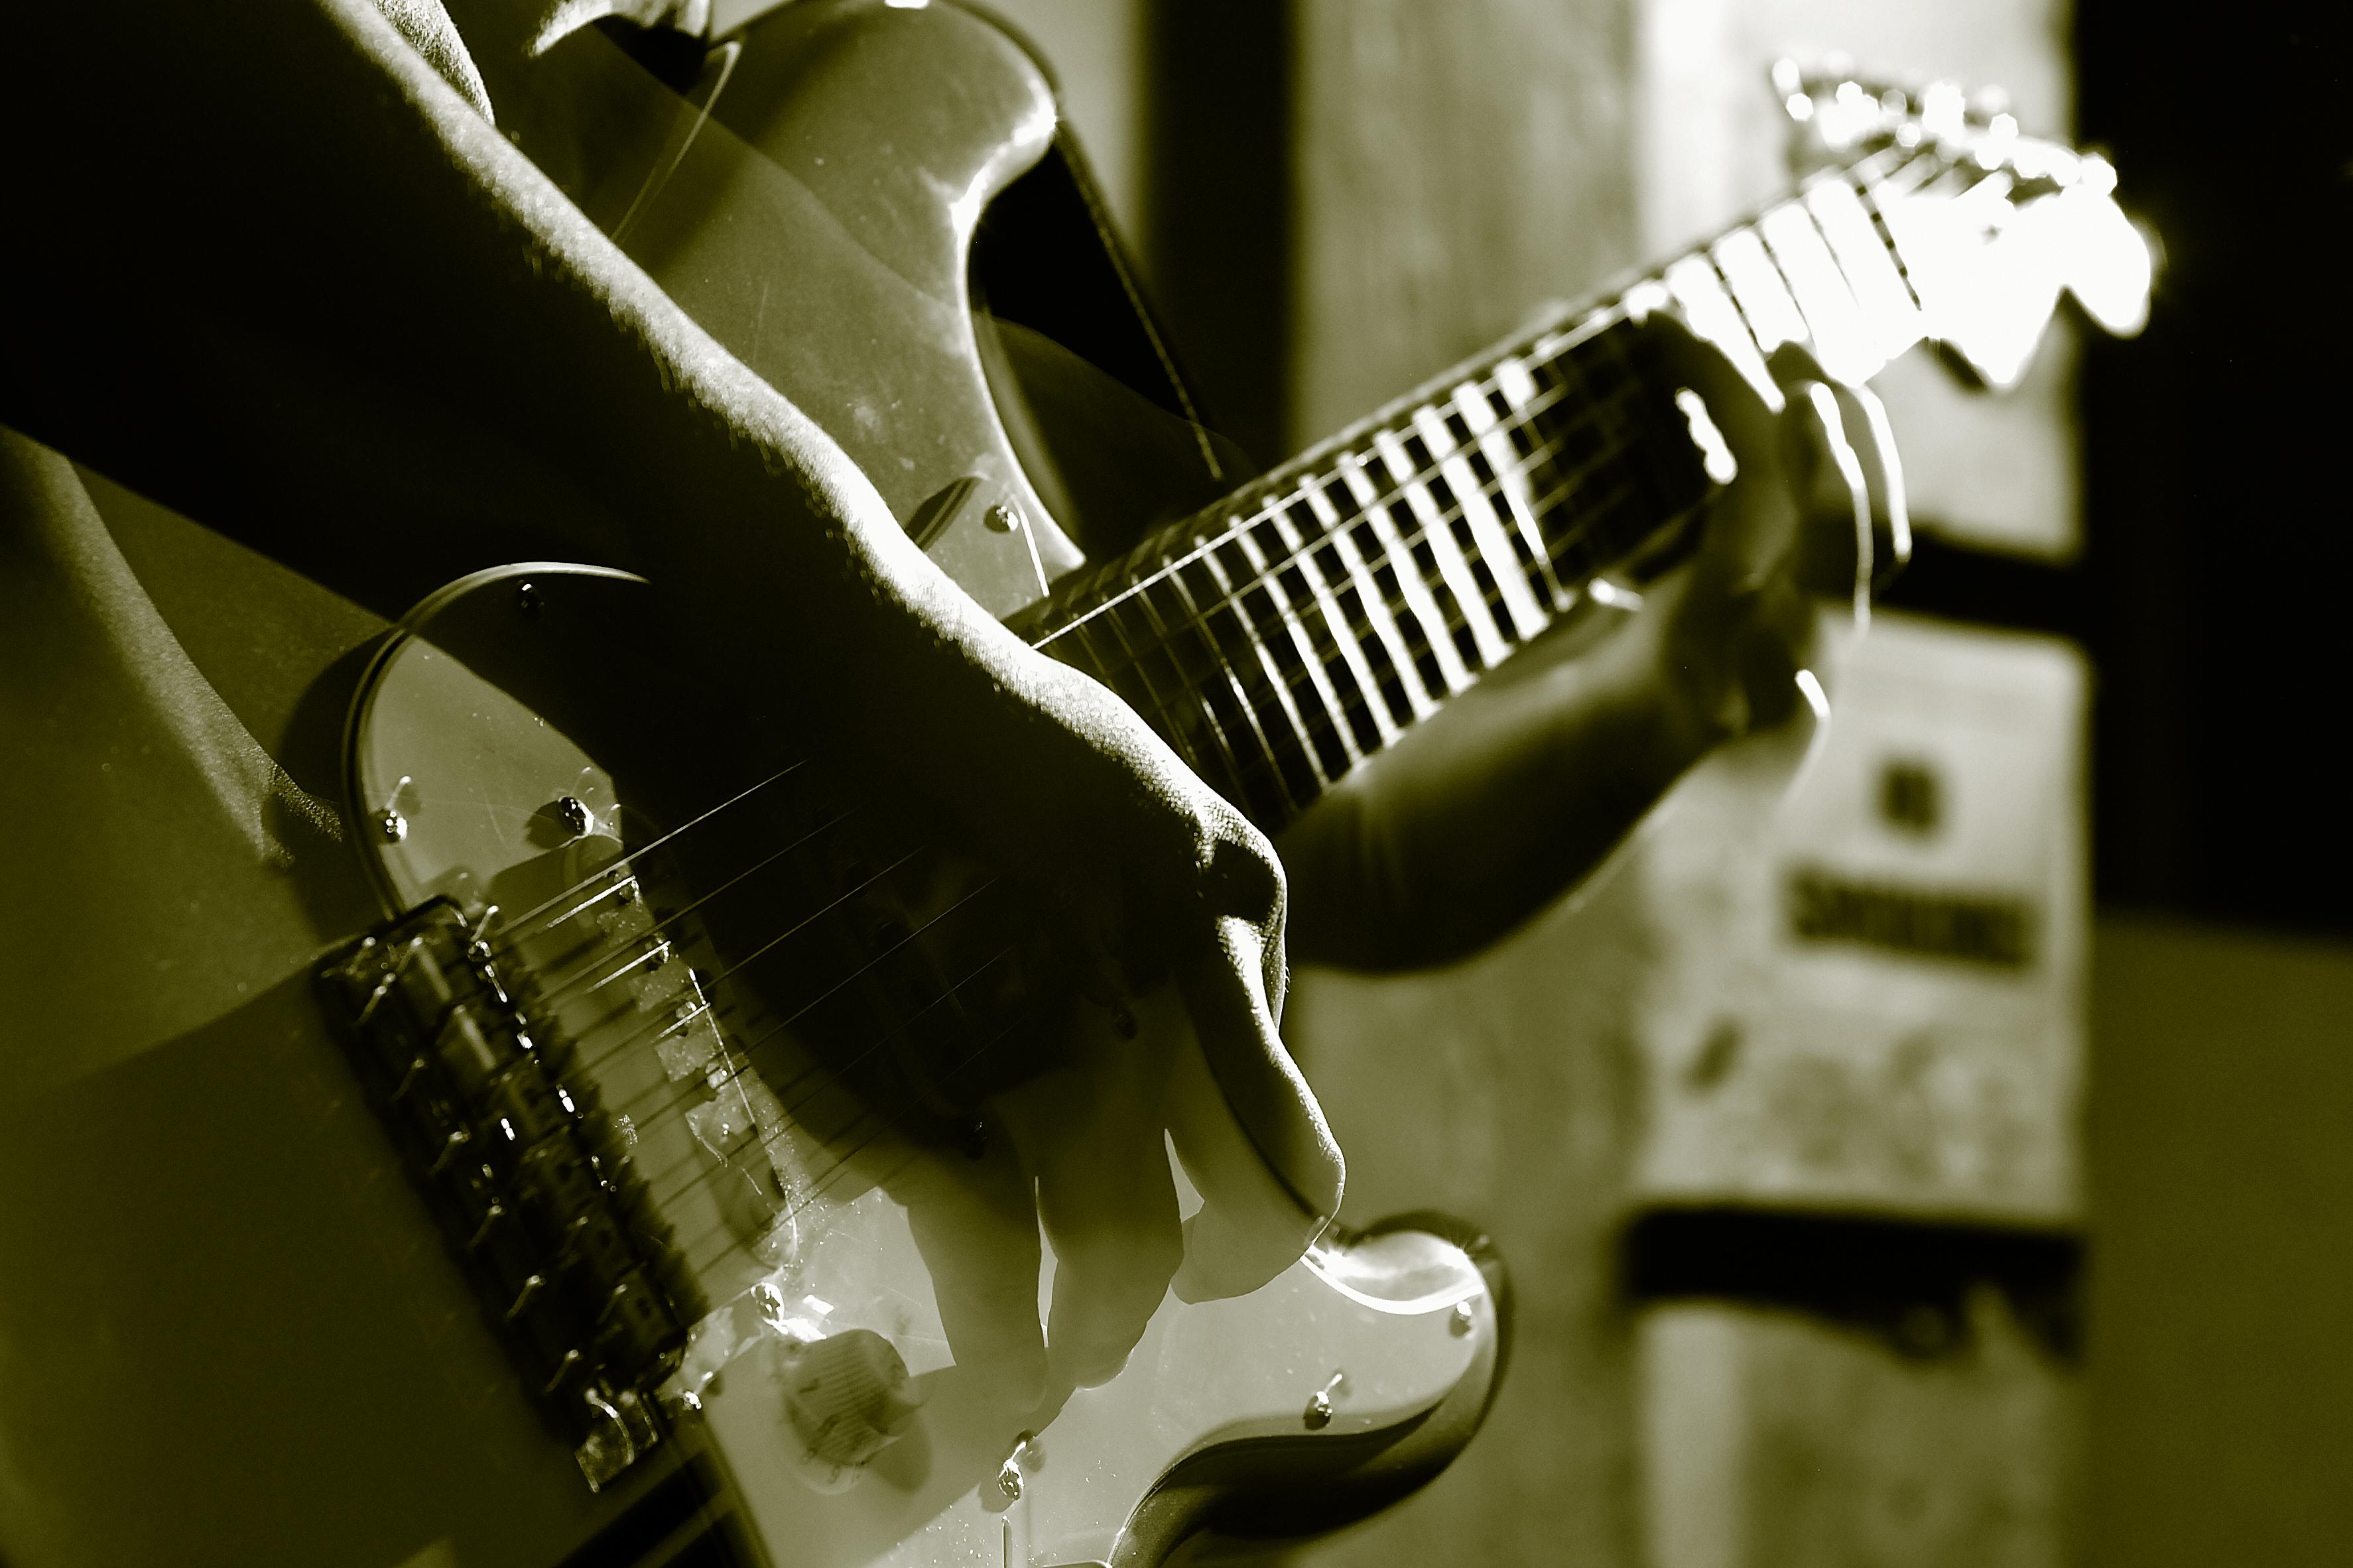 Guitar_play.jpg